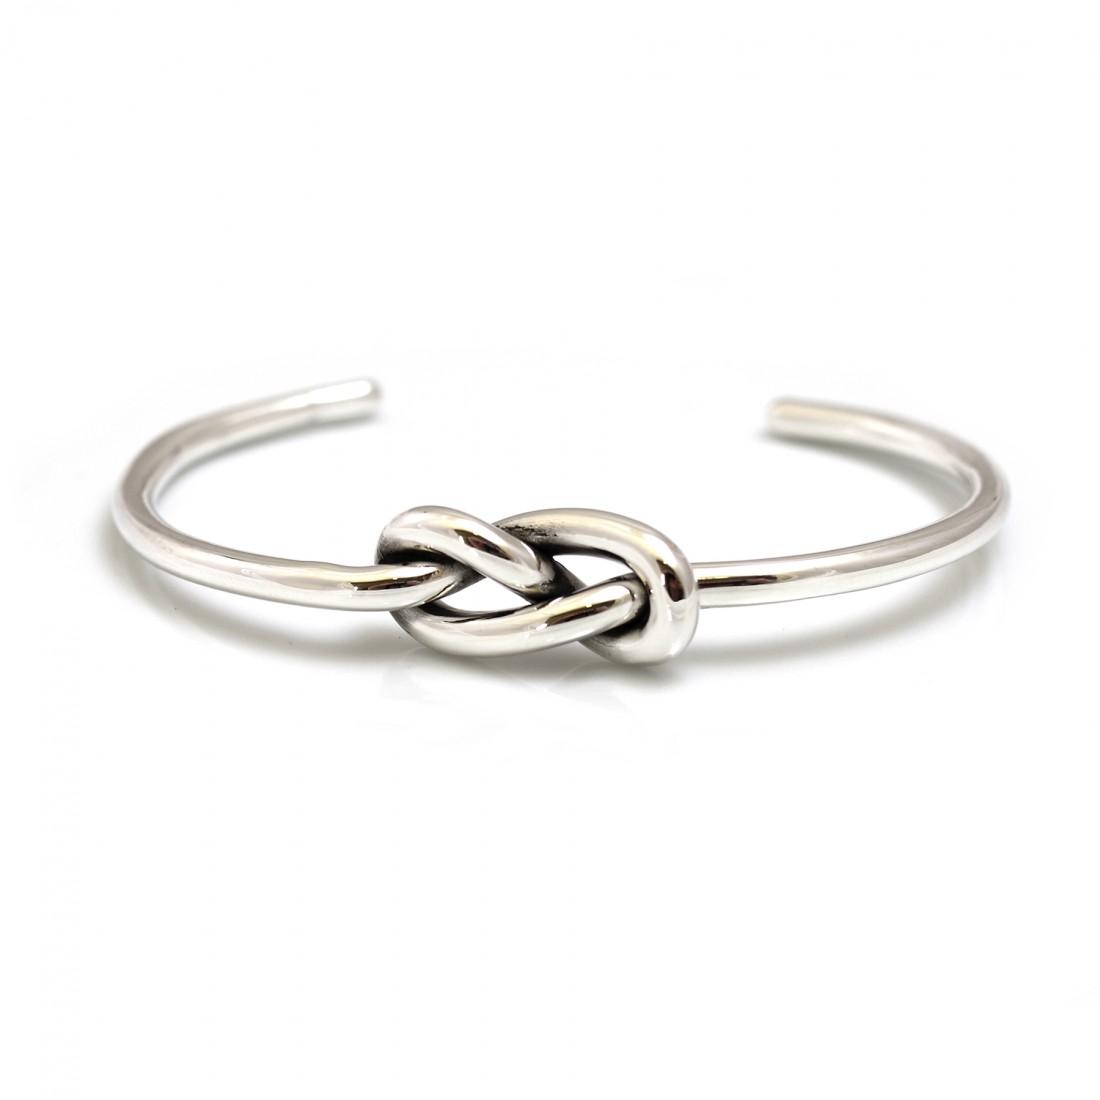 Sterling Silver Double Knot Cuff Bracelet